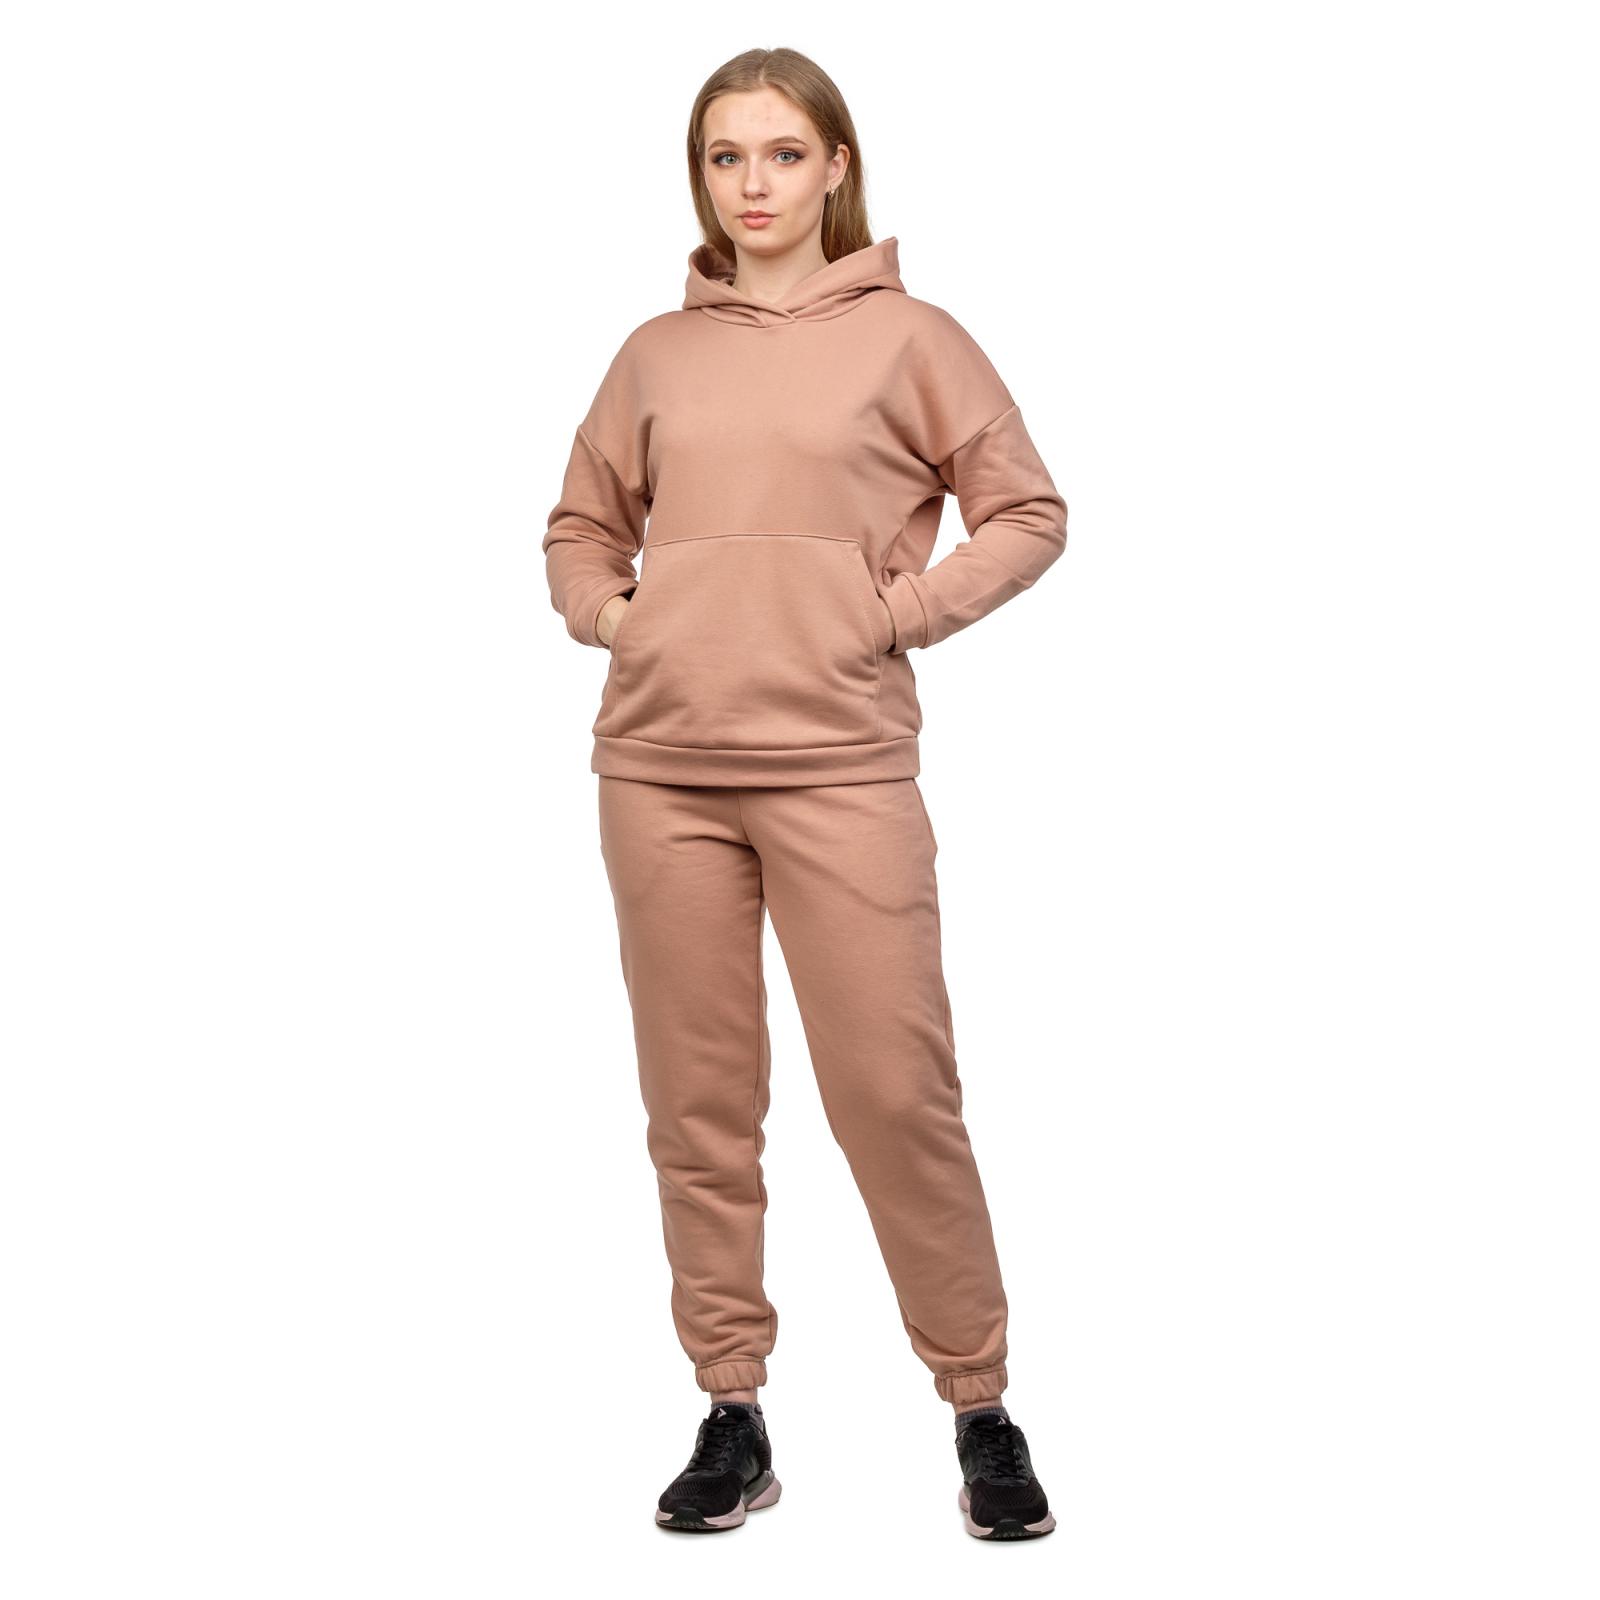 Костюм футер-петля Бежевый (худи+брюки) М-0186БЕЖ